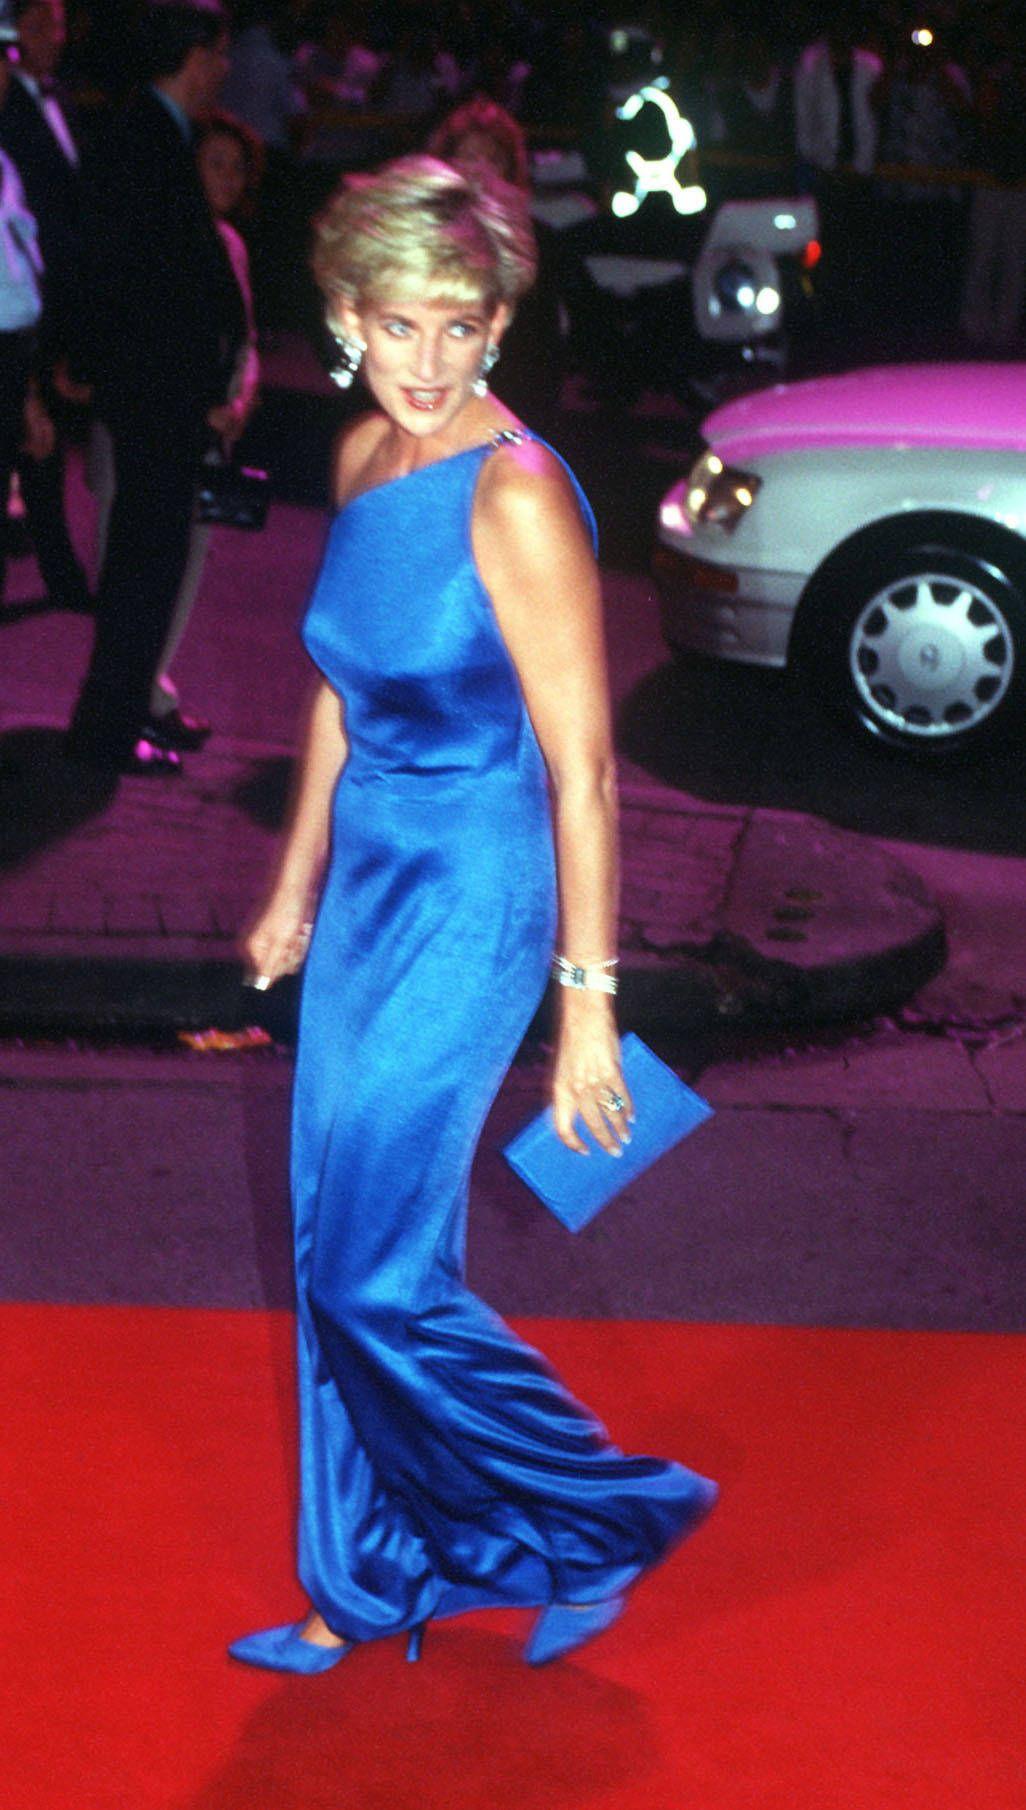 Yahoo Image Detail For Http 0 Tqn Com D Fashion 1 0 5 Q 2 51581134 10 Jpg Peinados De La Princesa Diana Iconos De Moda Joyas De La Princesa Diana